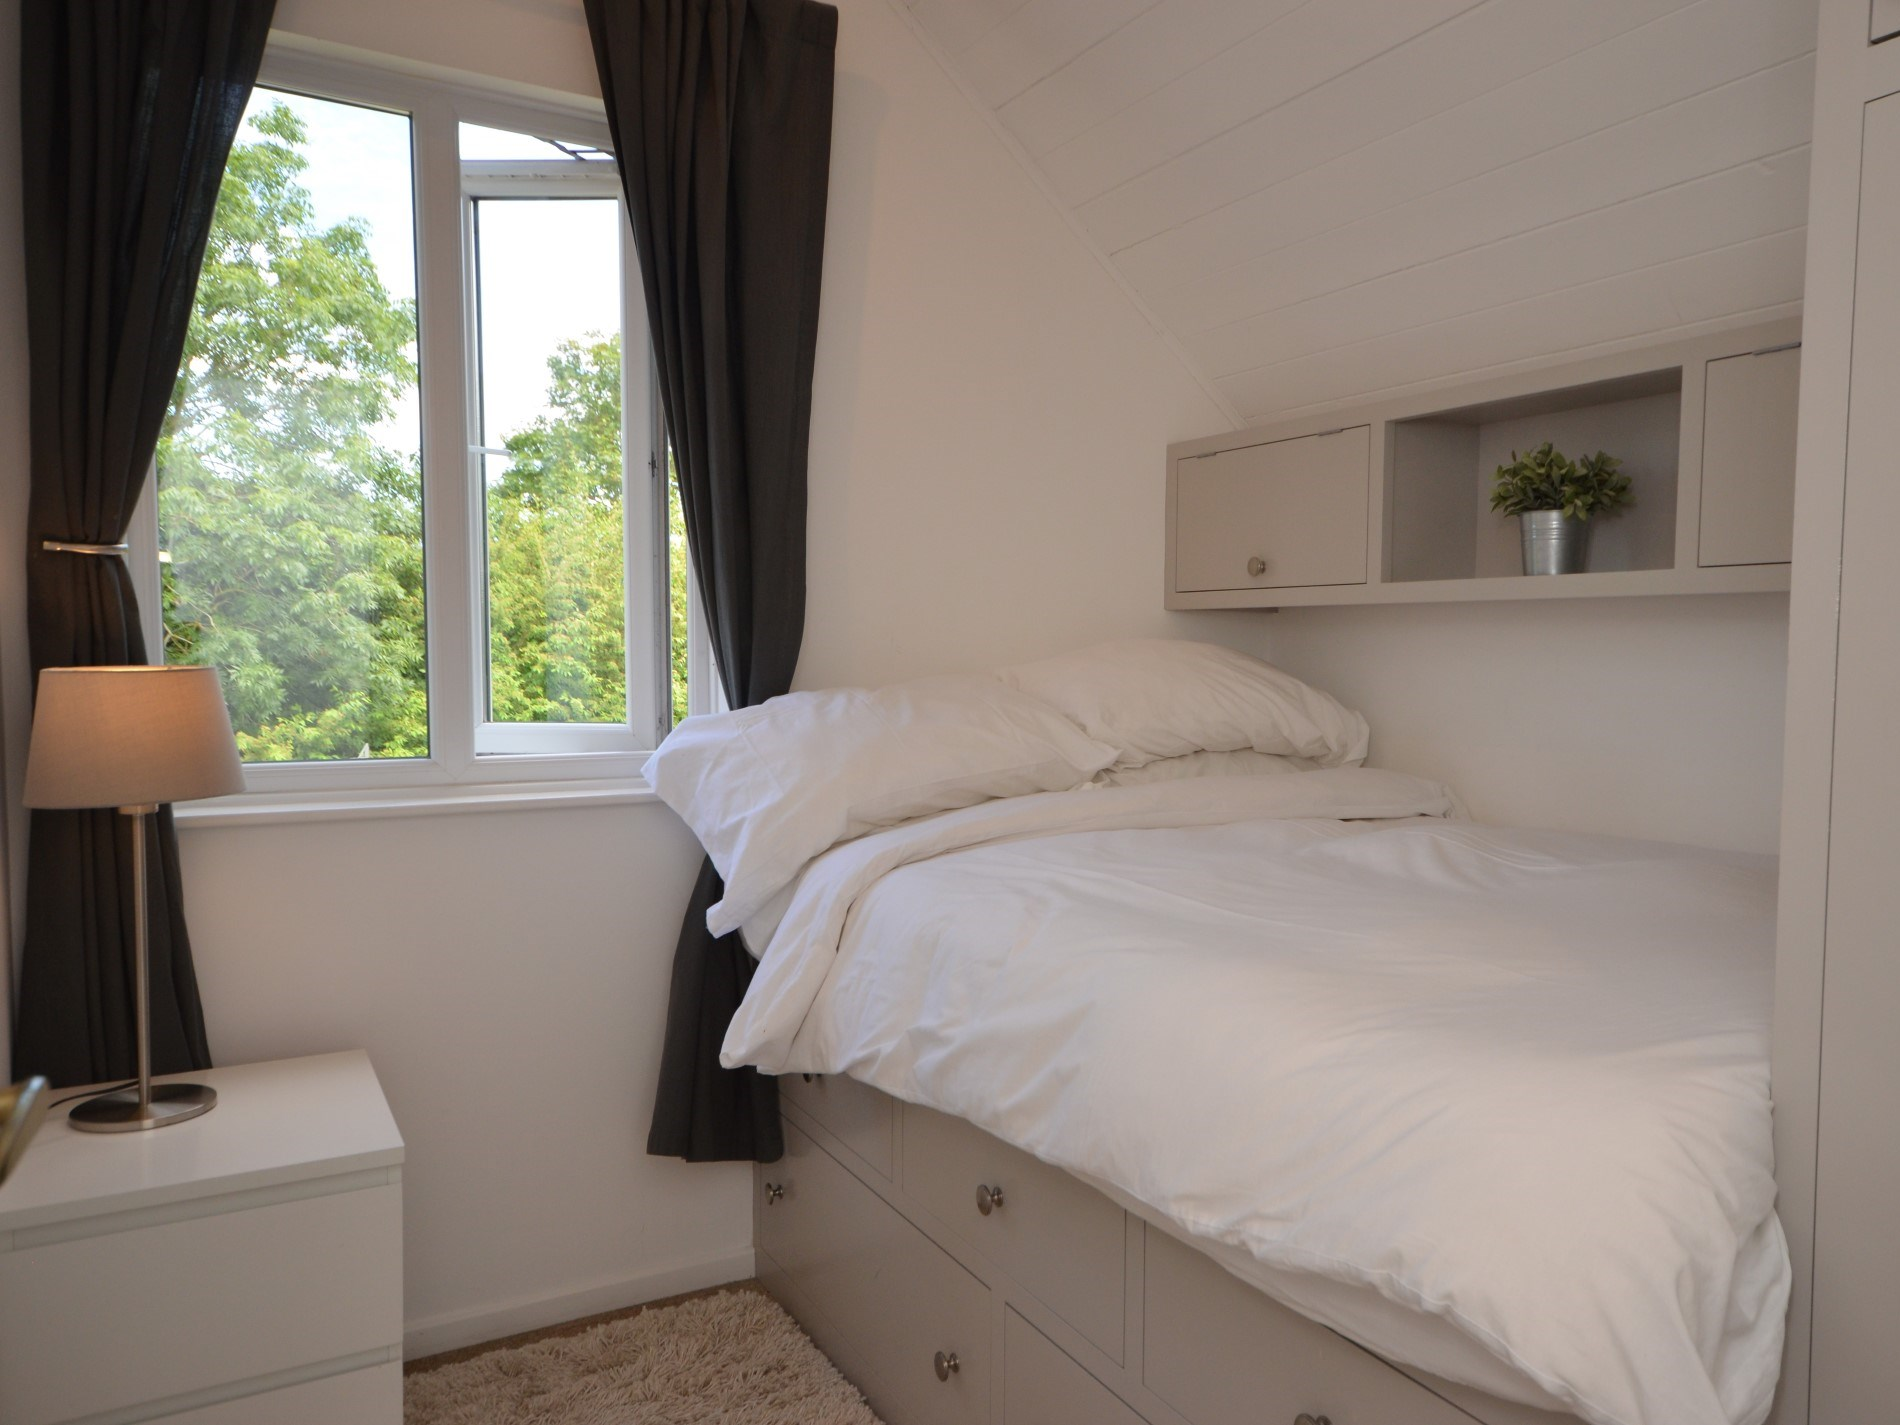 4 foot double bedroom with plenty of storage